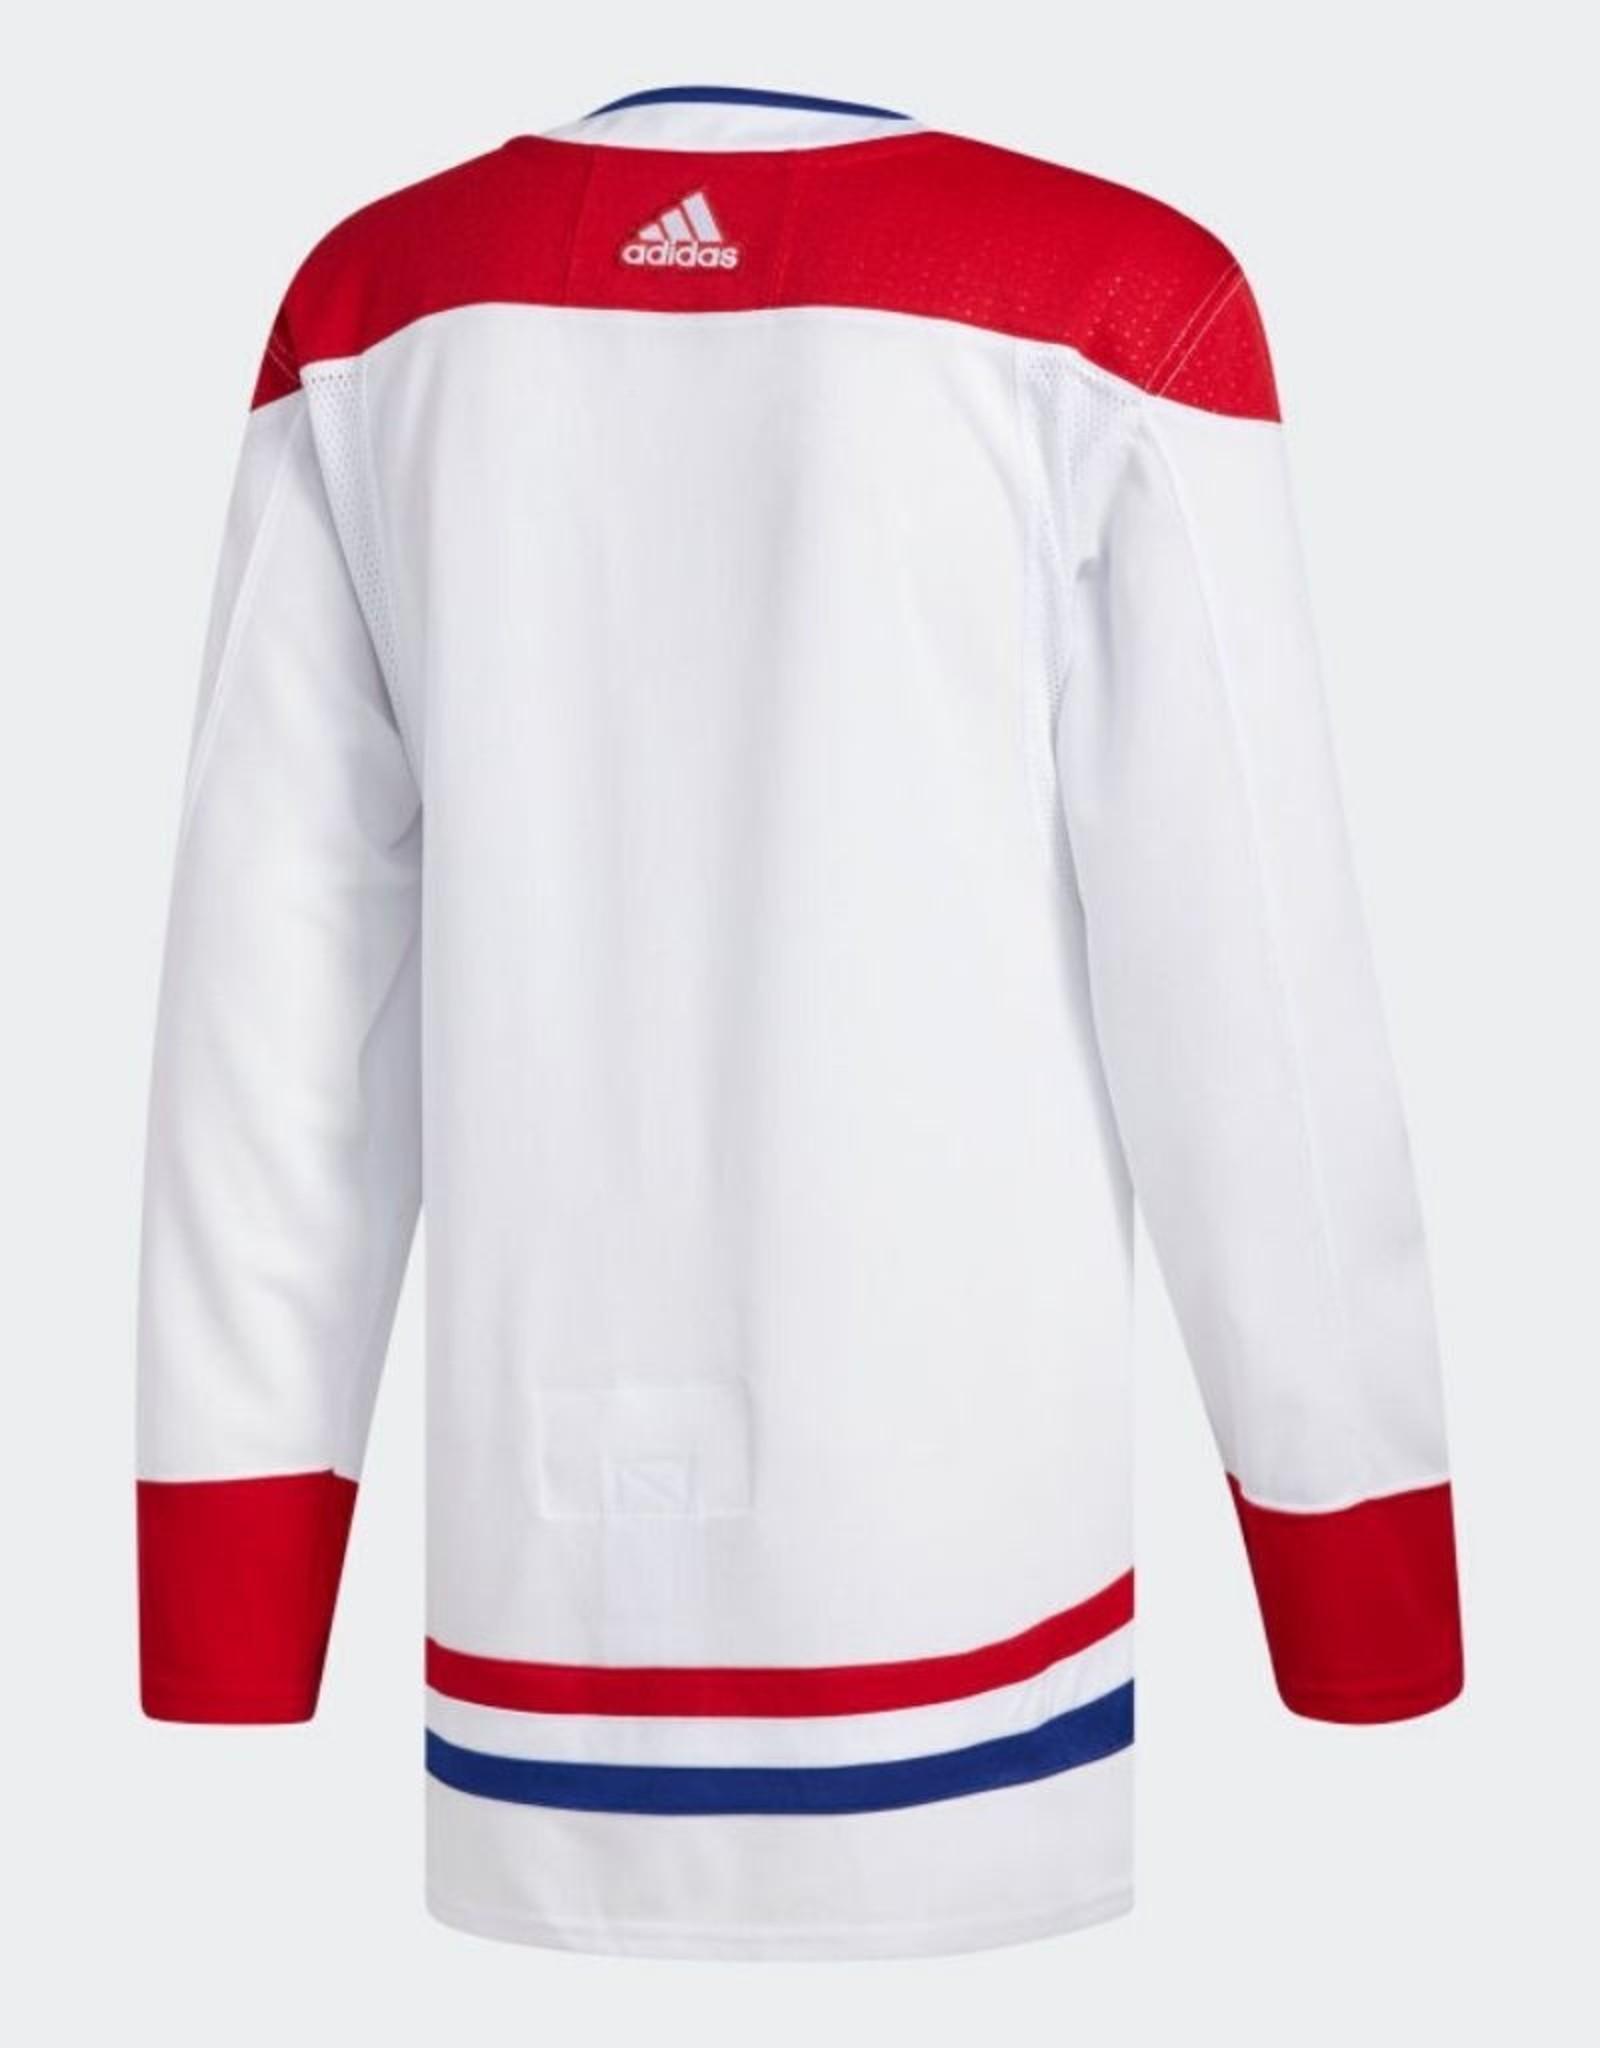 Adidas NHL Adidas Away Jersey Canadiens White